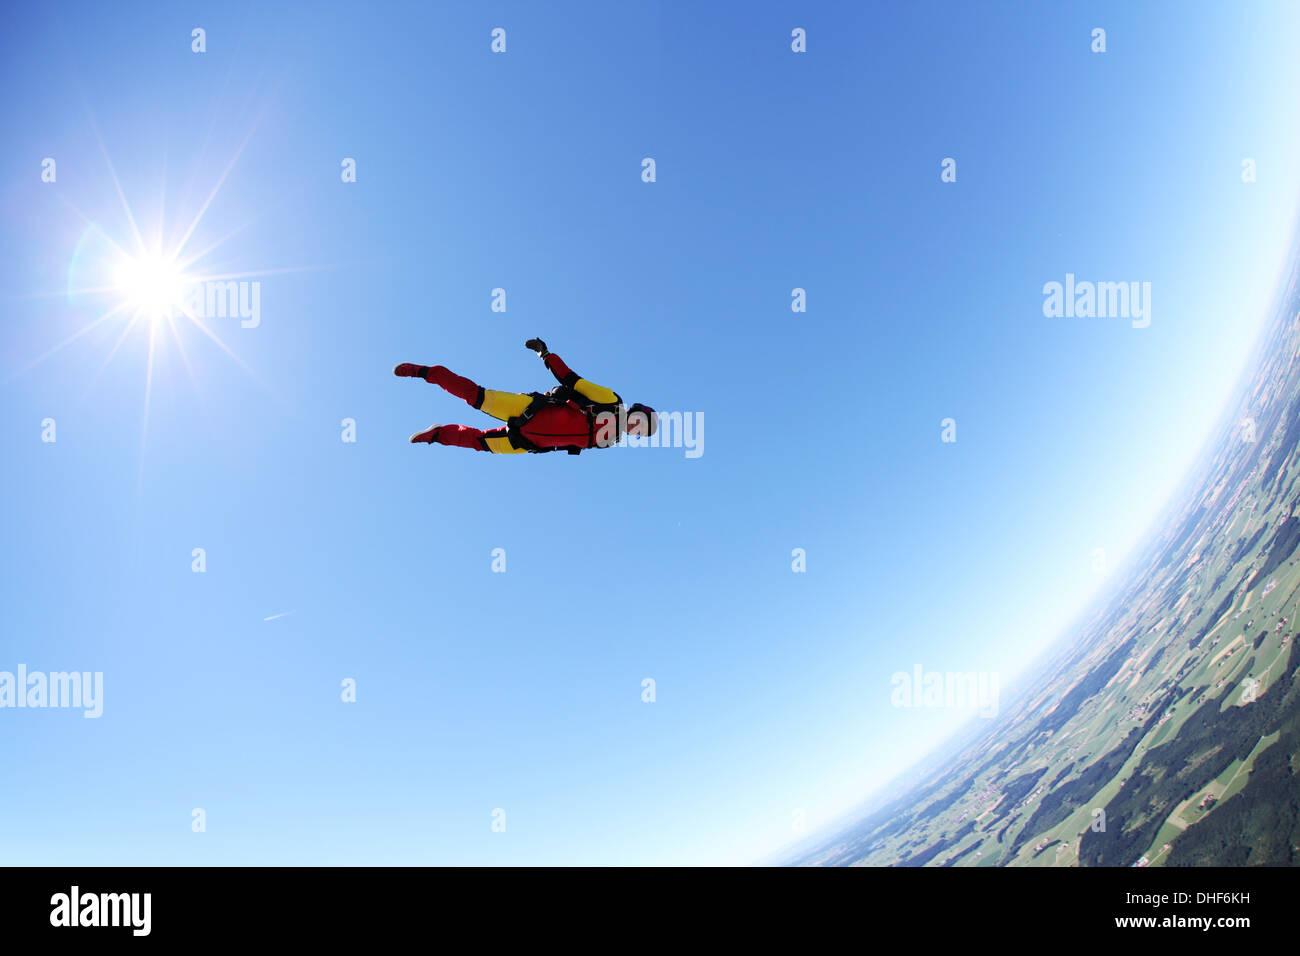 Paracaidista en caída libre boca abajo encima de Leutkirch, Baviera, Alemania Imagen De Stock